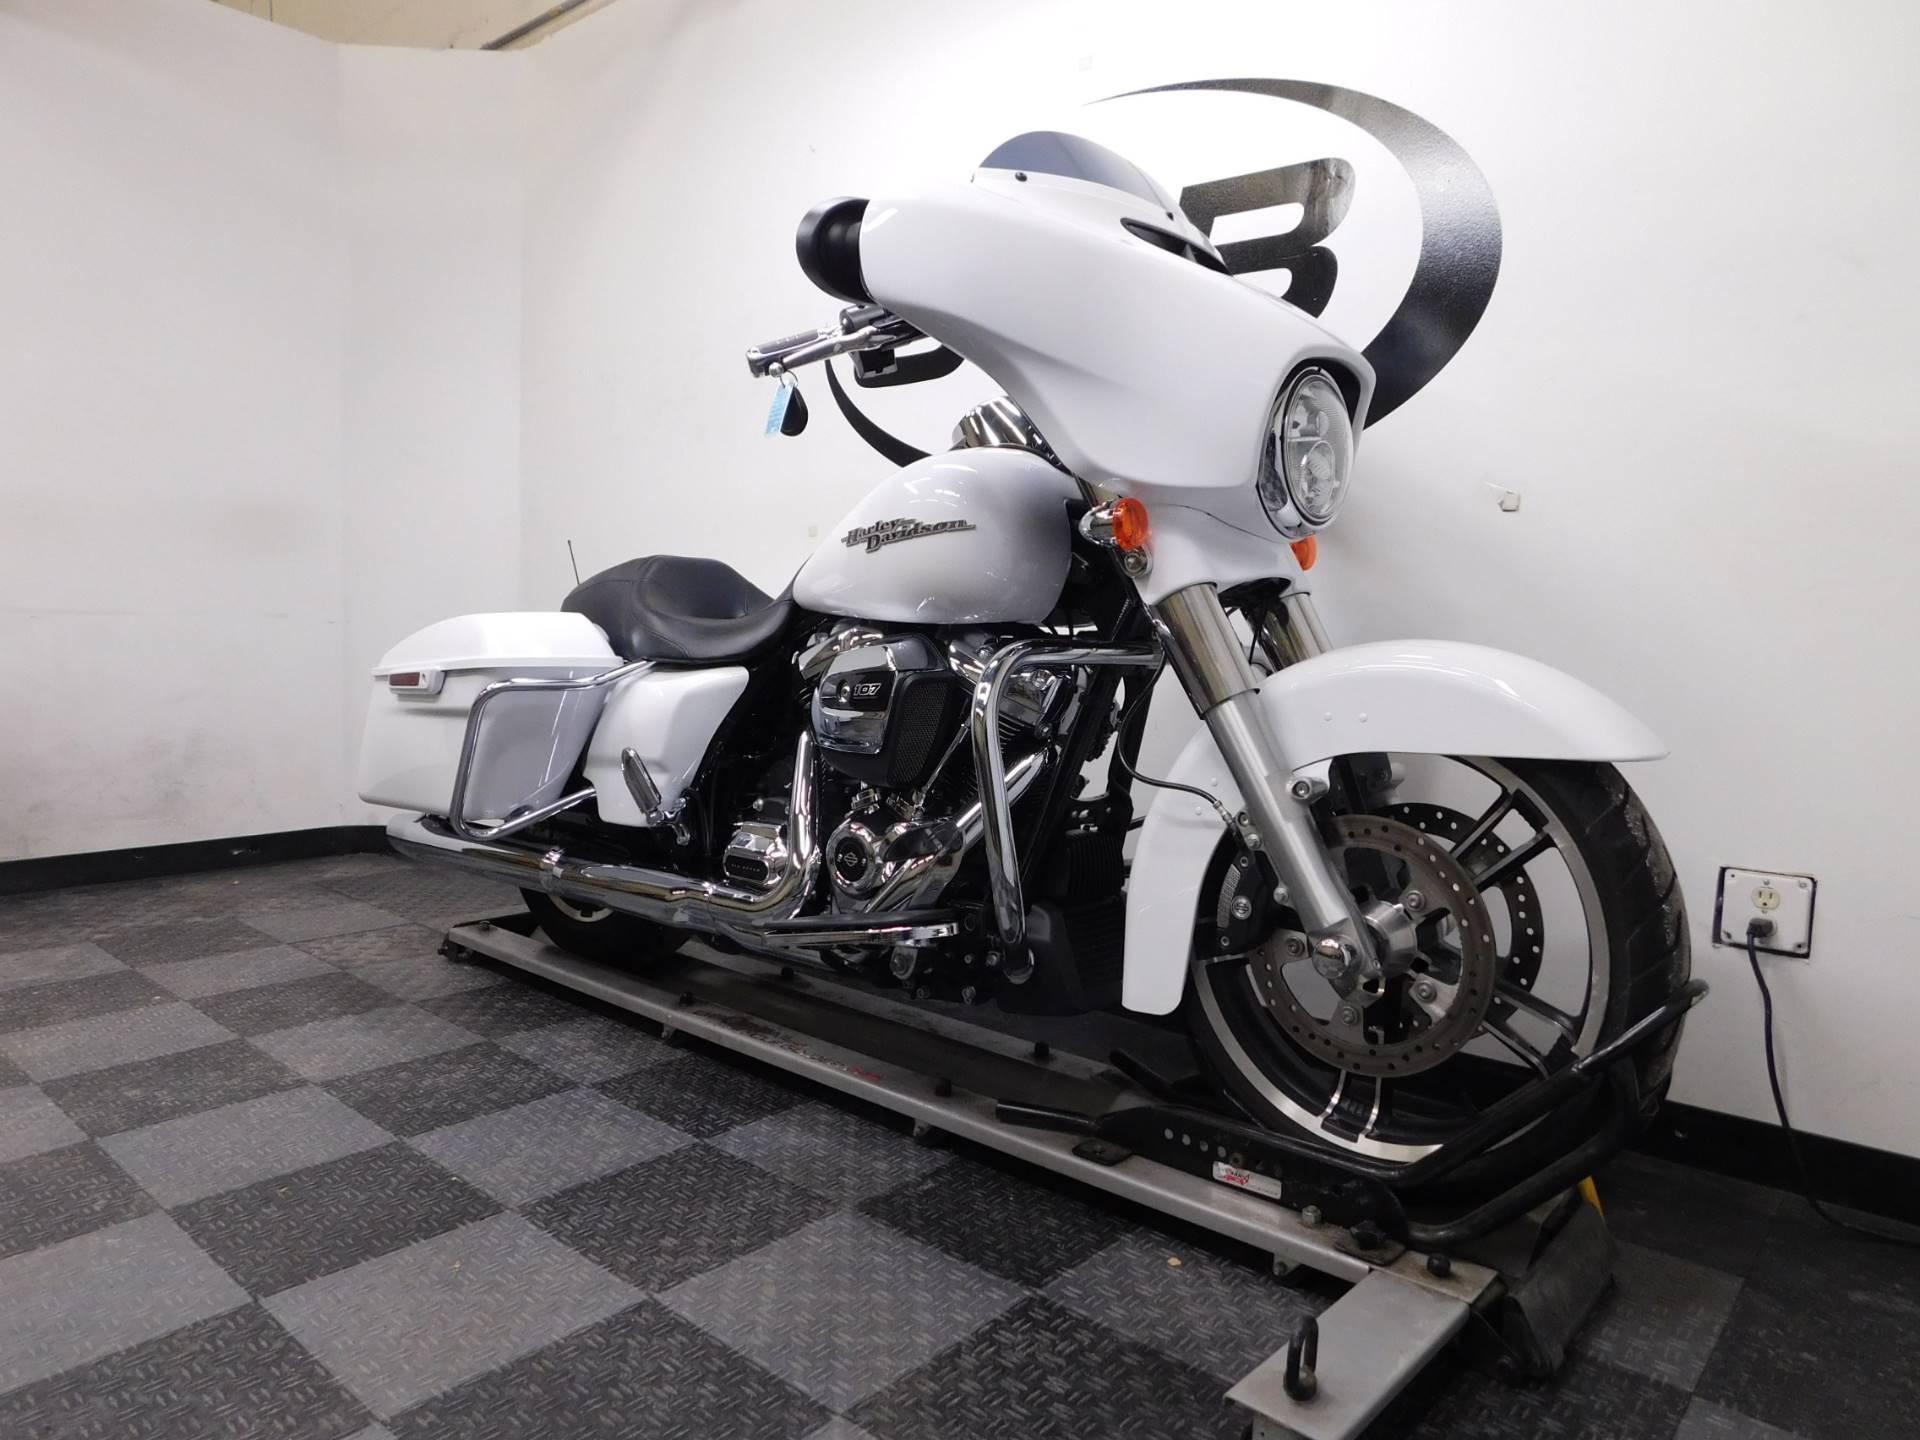 2017 Harley-Davidson Street Glide Special 2